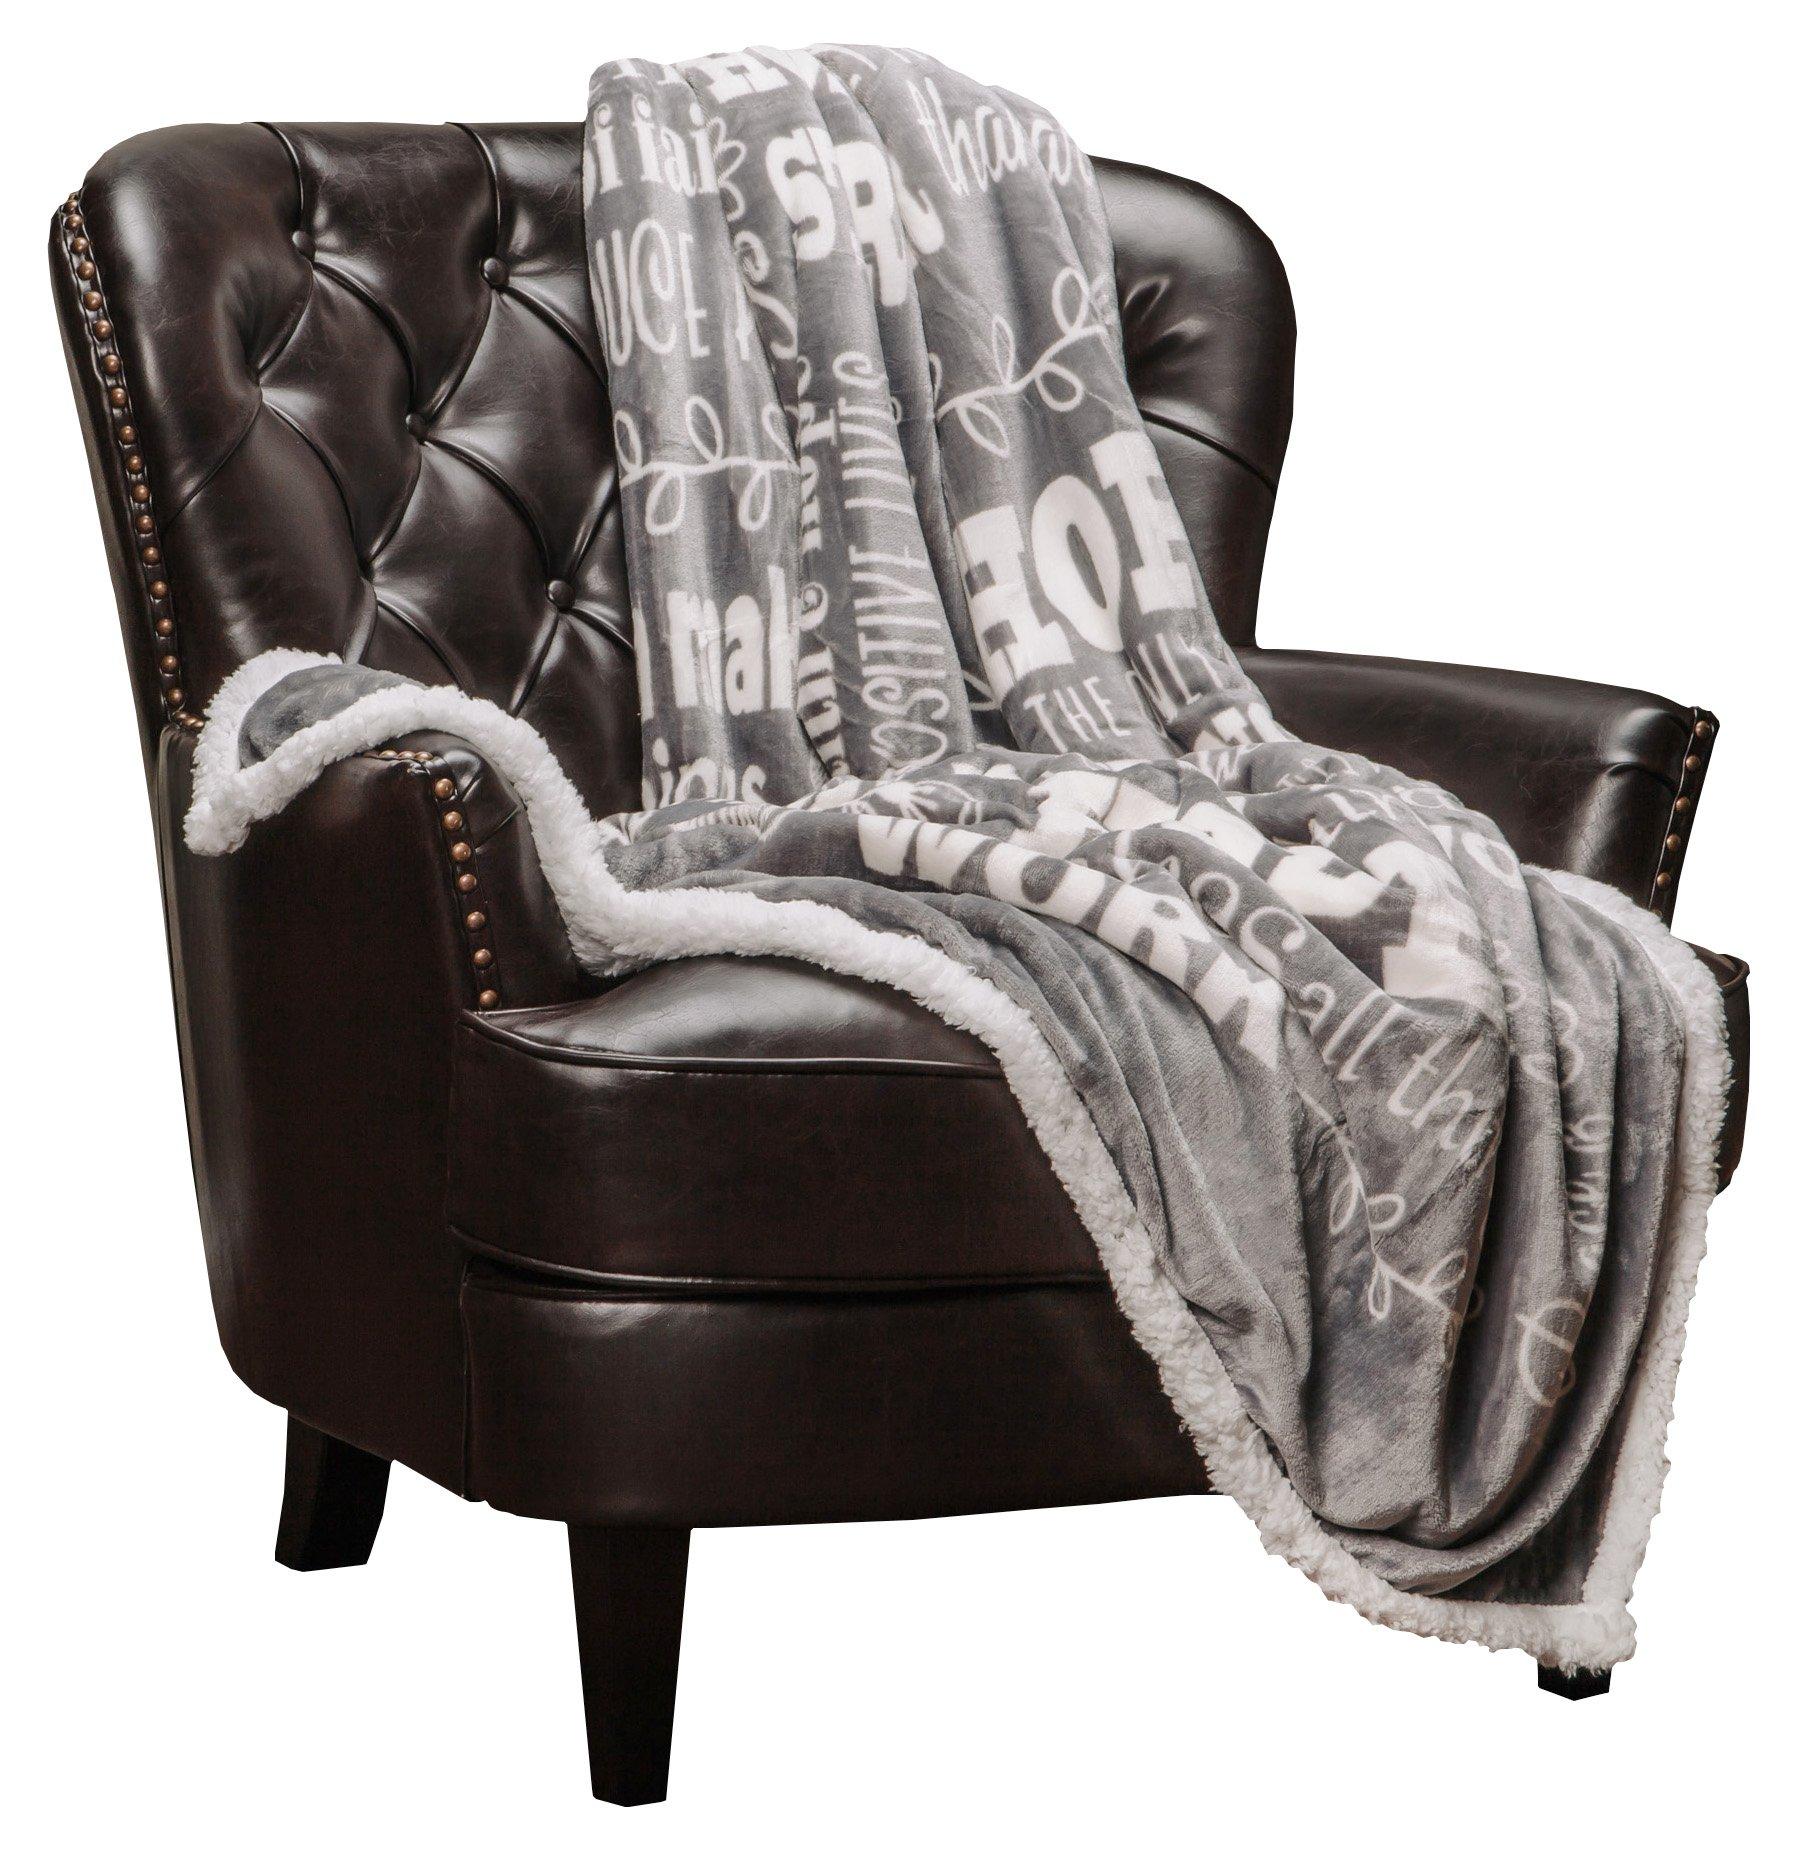 Chanasya Hope and Faith Inspirational Message Print Super Soft Ultra Plush Cozy Fleece Microfiber Sherpa Posivite Energy Comfort Caring Uplifting Gift Throw Blanket - for Women Men - Grey Blanket